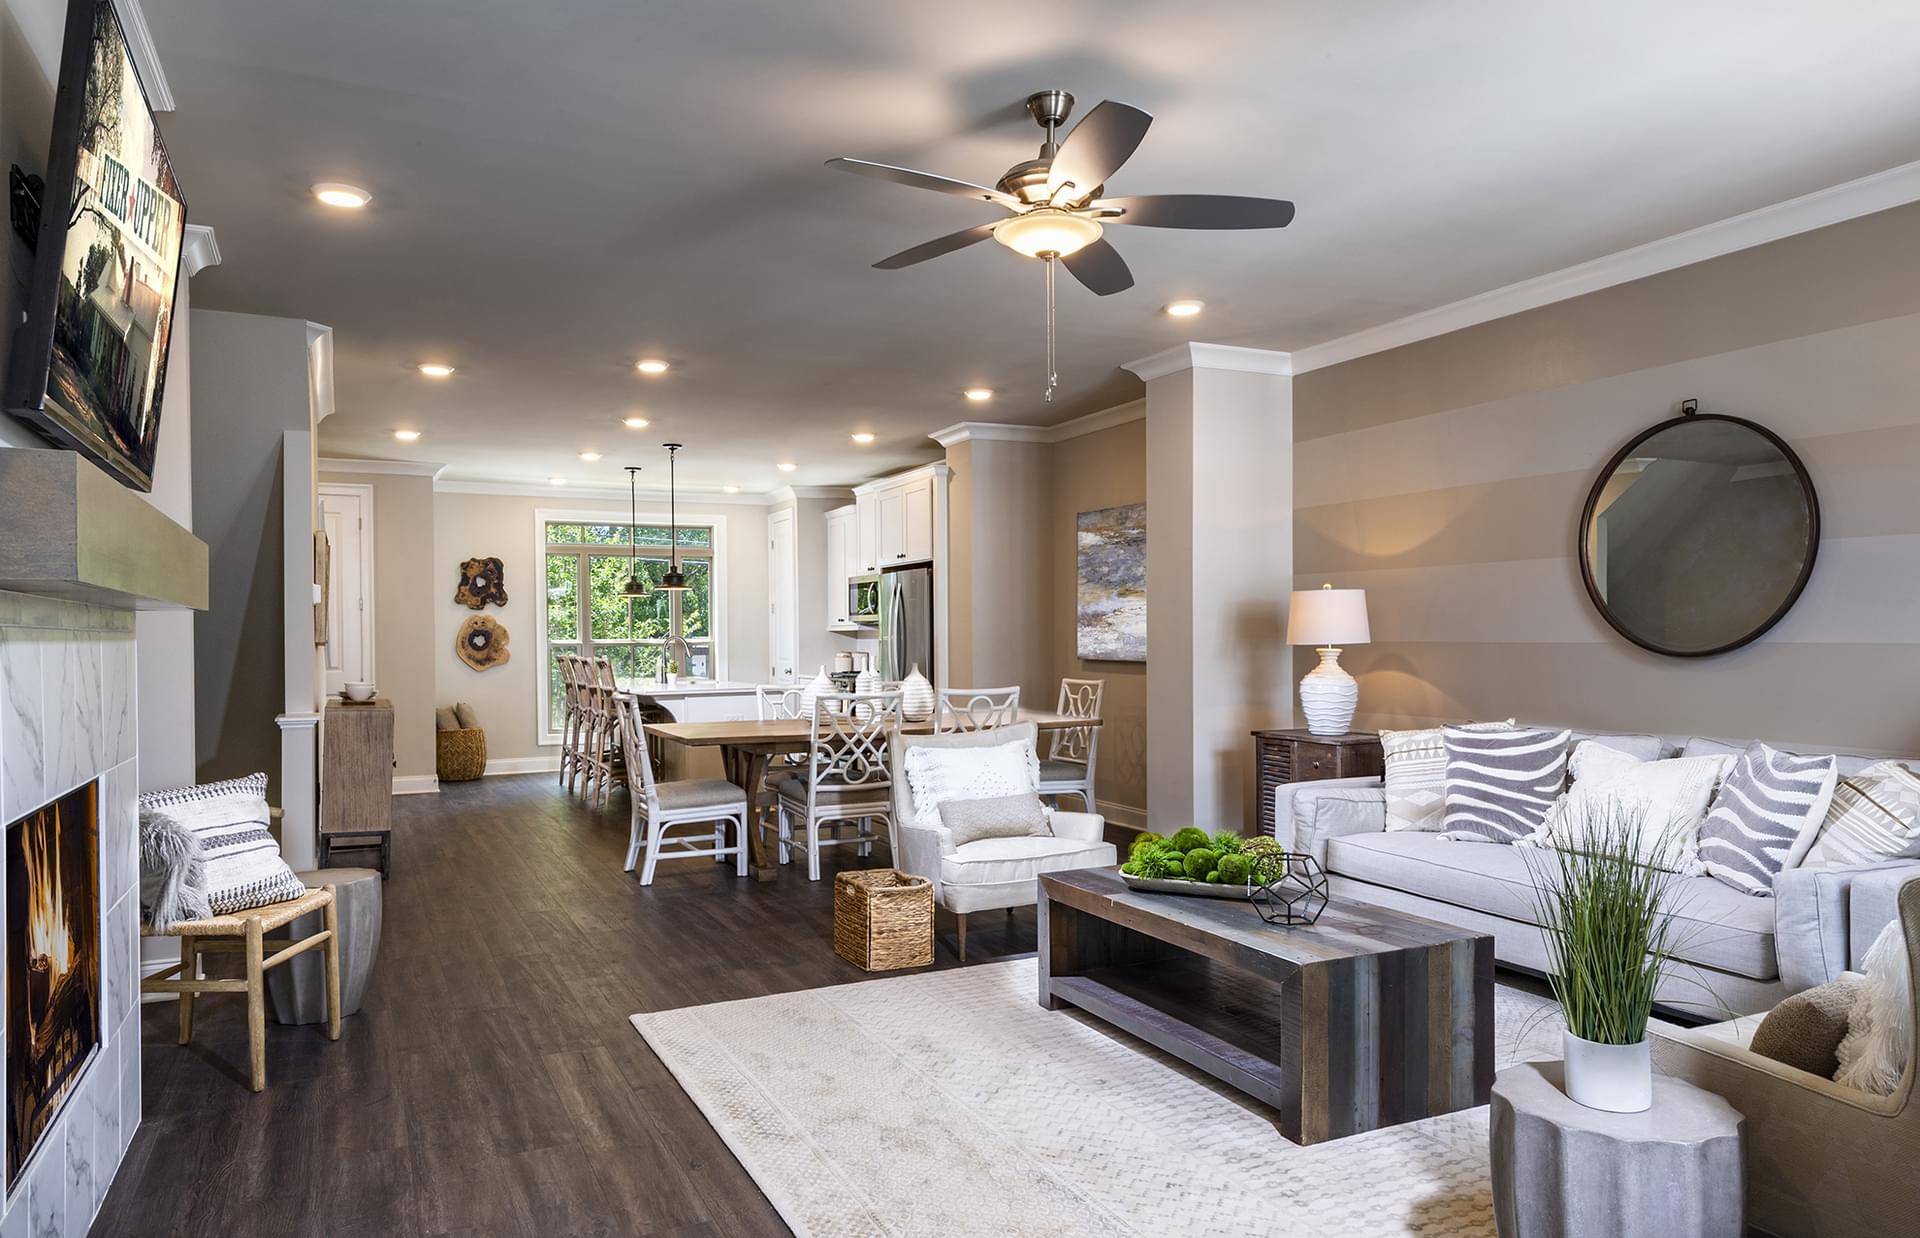 The Garrett II New Home in Smyrna GA